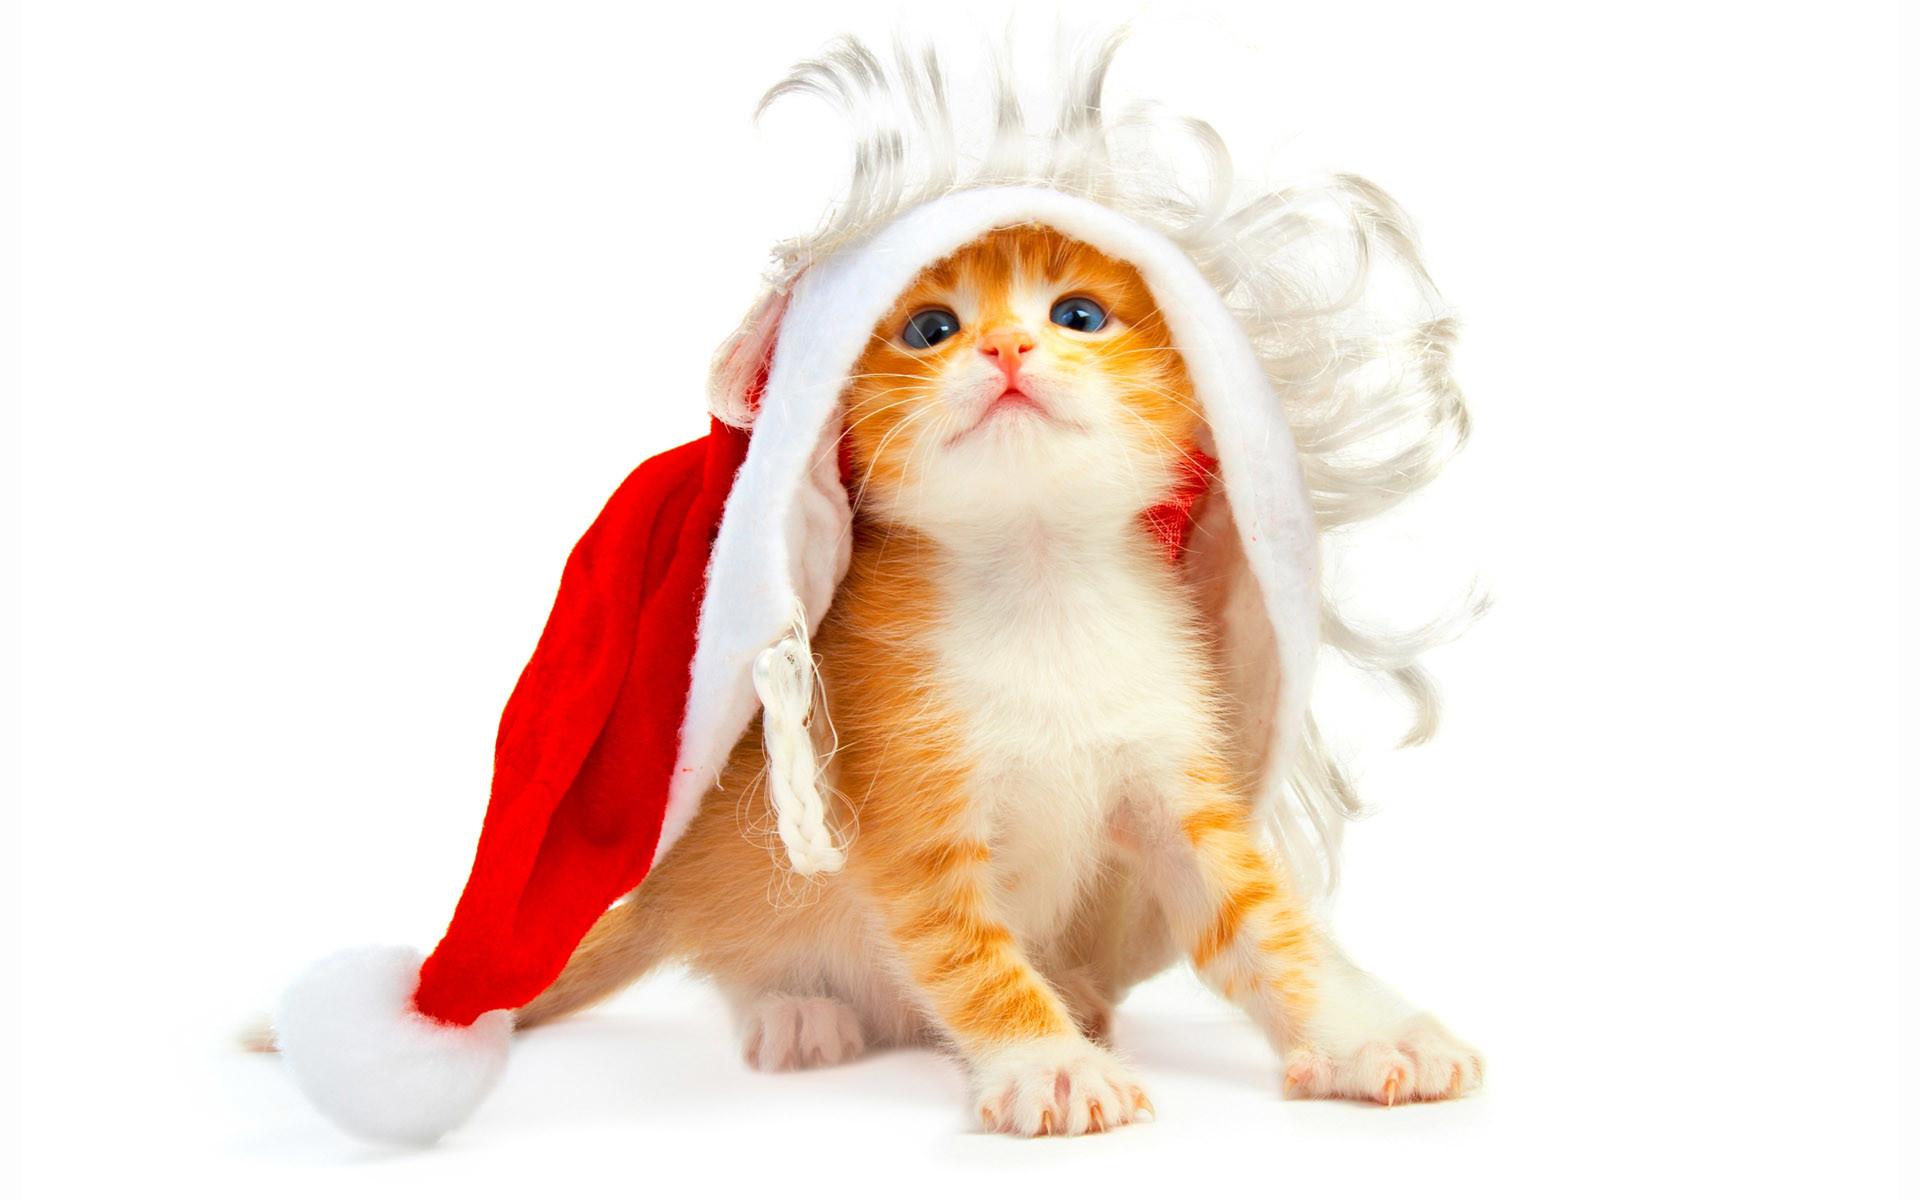 Funny Christmas Wallpaper | Christmas Wallpaper